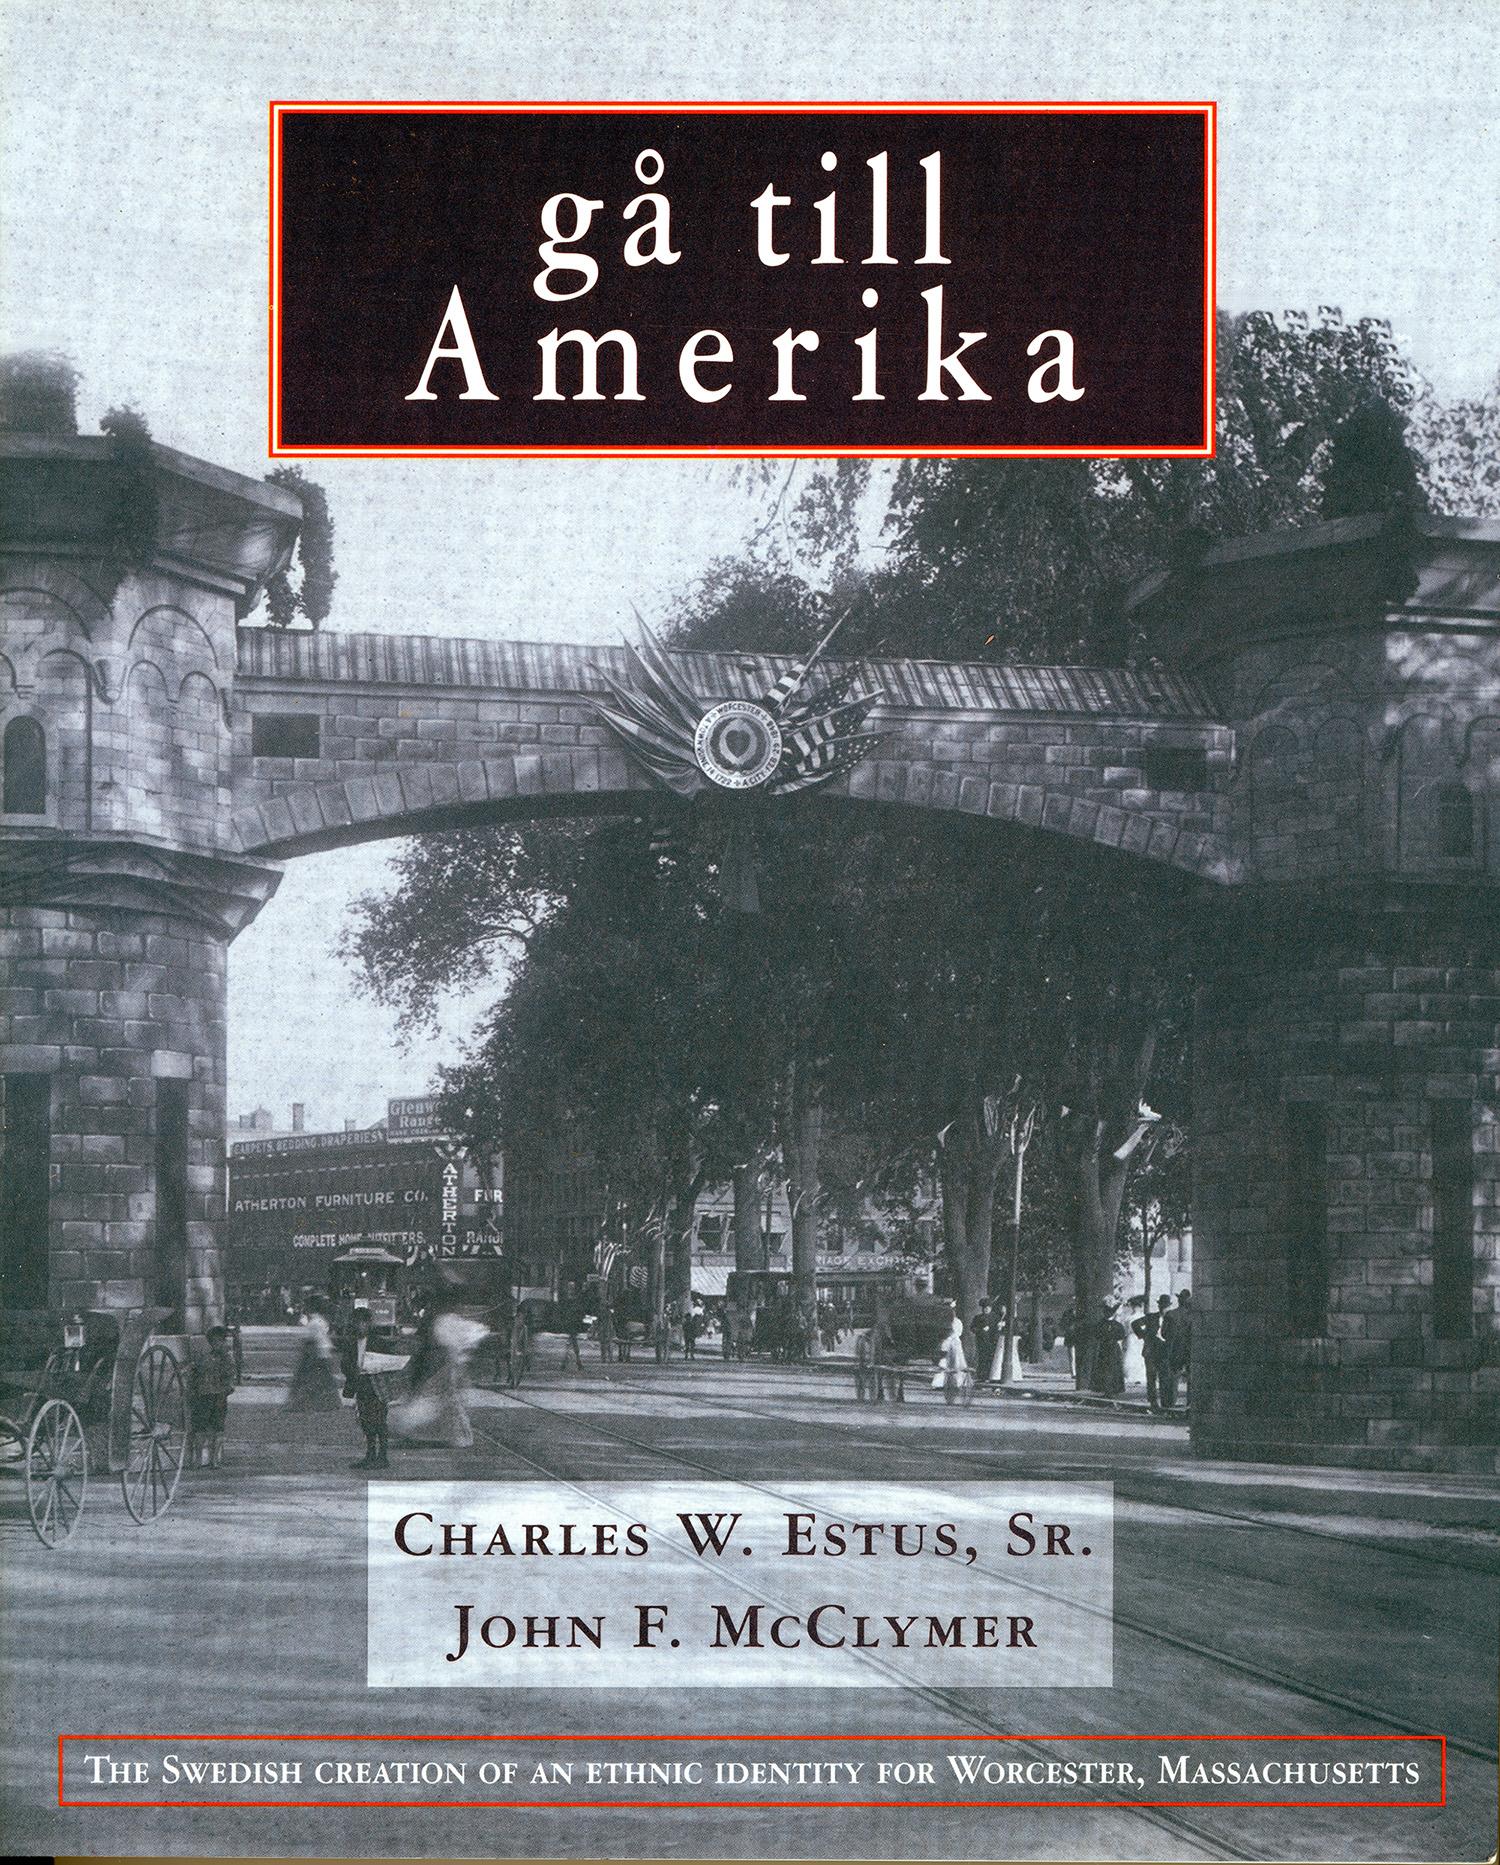 Ga till Amerika by Charles W. Estus and John F. McClymer